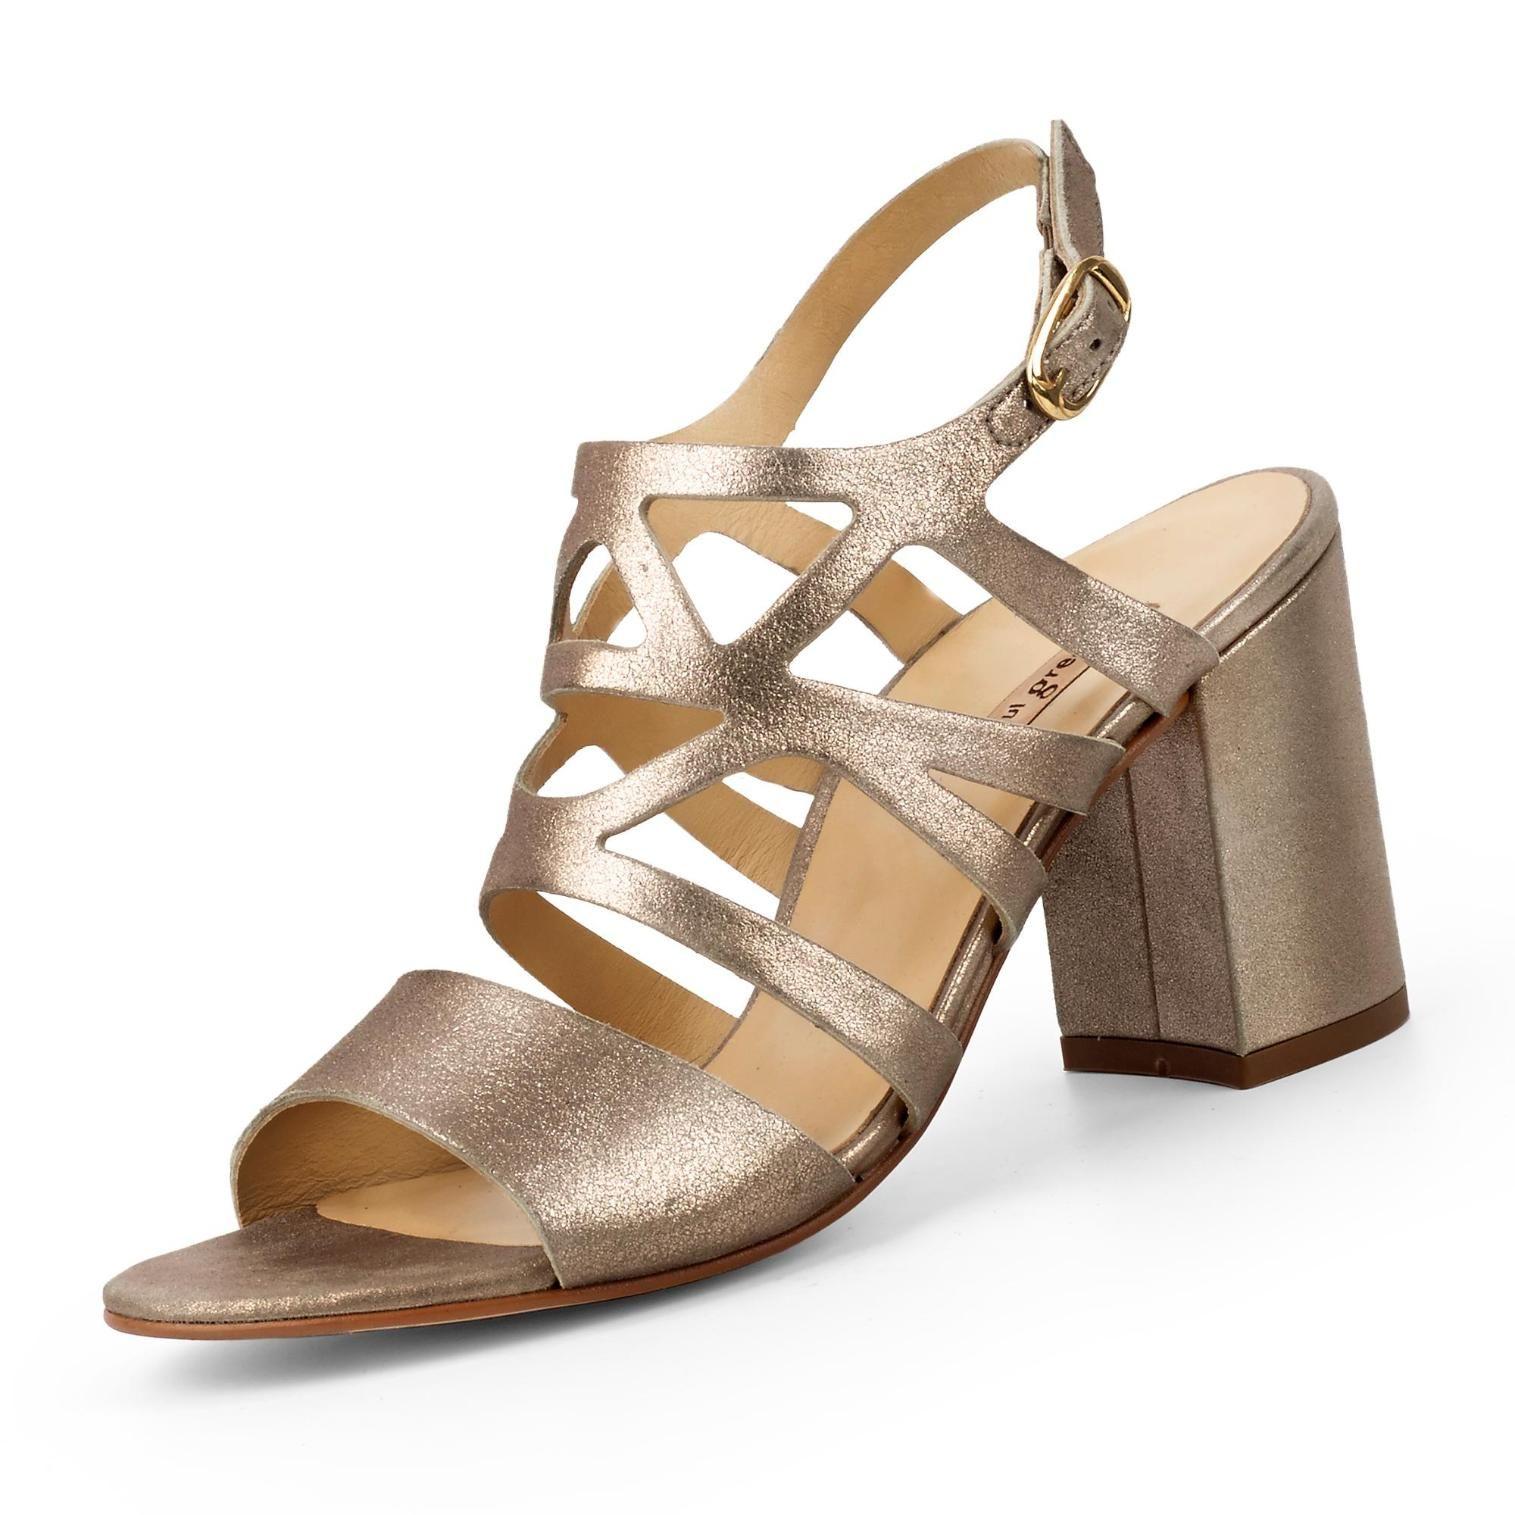 new style 79916 42637 Paul Green Sandalette | παπούτσια, 2019 | Παπούτσια